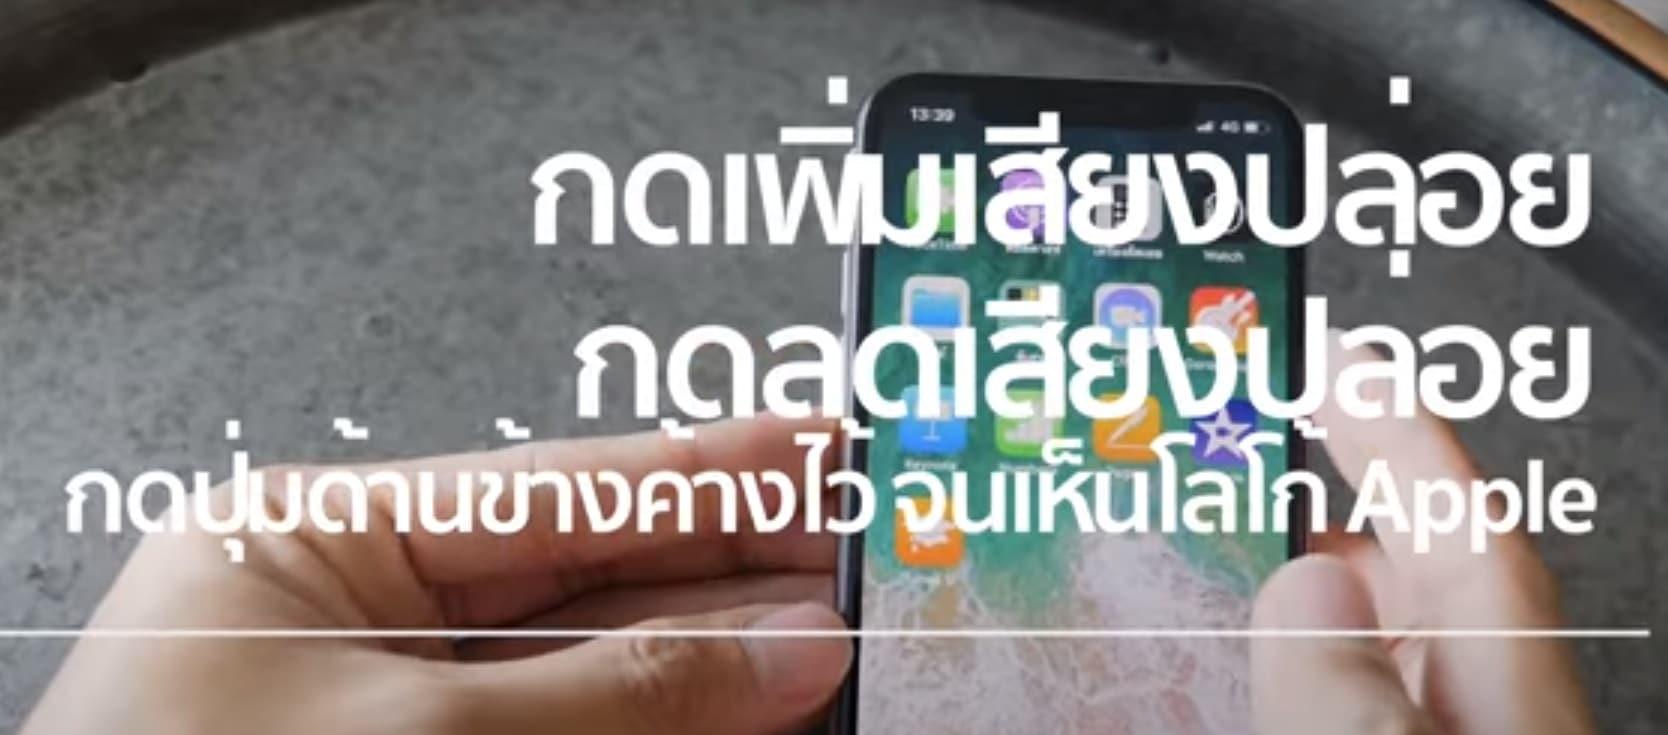 iPhone X เปิดไม่ติด ทำไงดี มีวิธีแก้อย่างไร 🥇 ศูนย์ซ่อม โทรศัพท์มือถือ มือถือทุกรุ่น ทุกยี่ห้อ iPhone | Apple | Samsung | Huawei